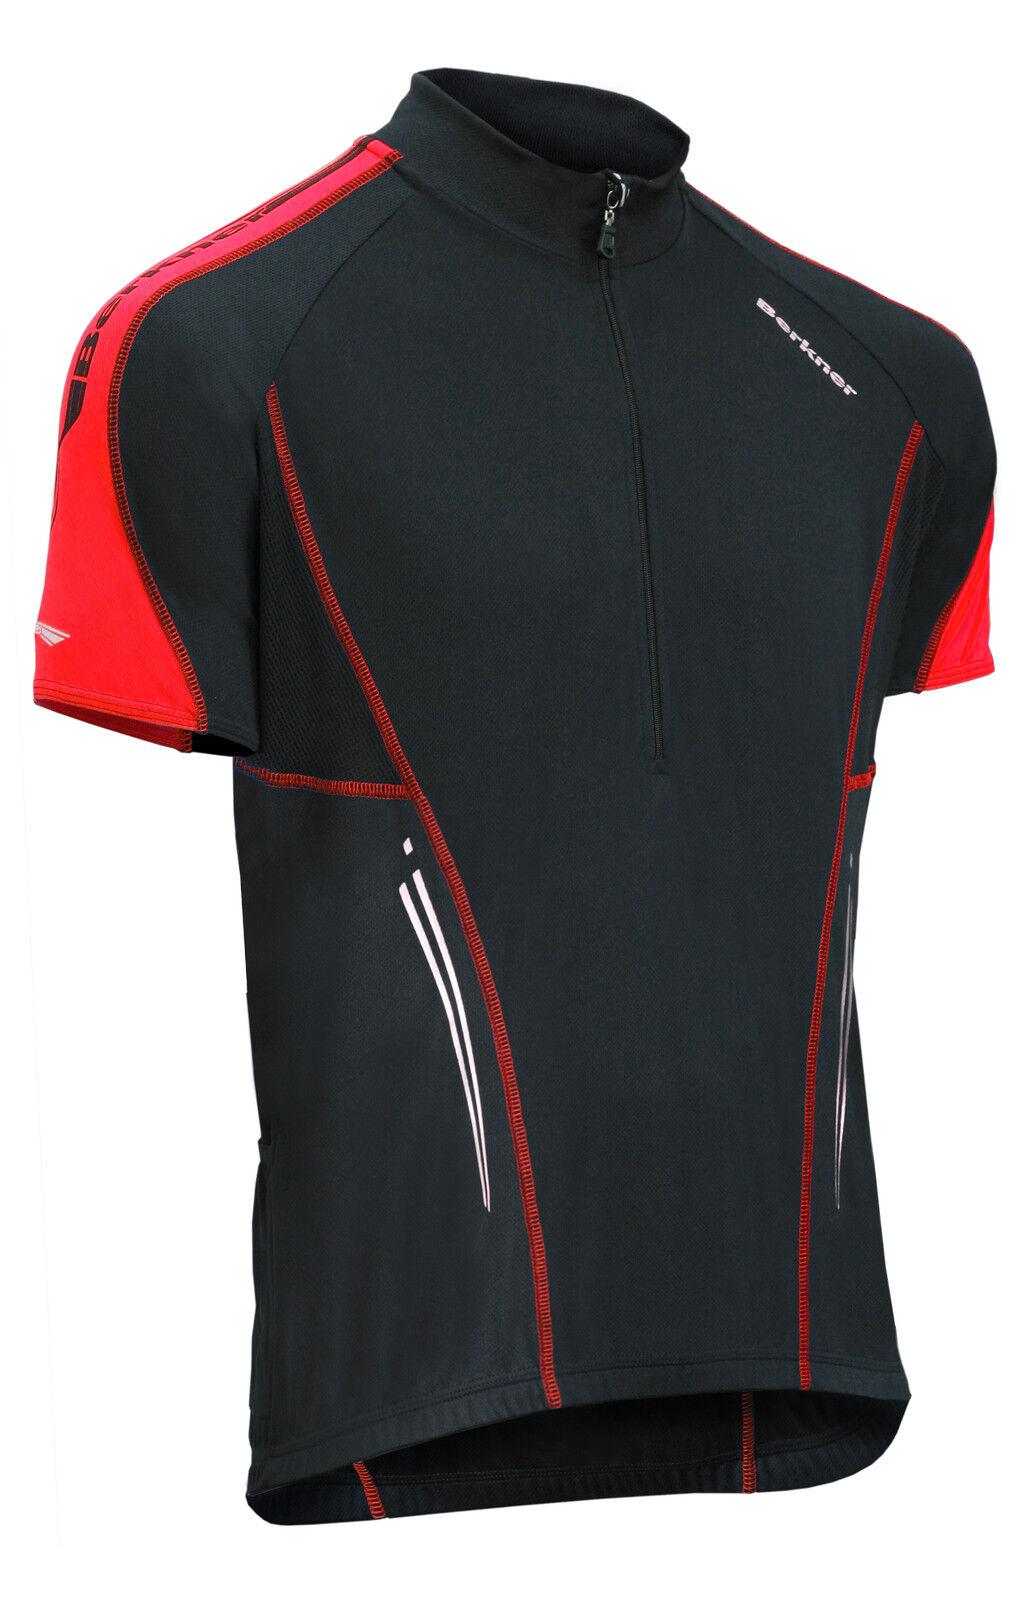 Biketrikot, Berkner Bikeshirt, Fahrradtrikot Berkner Biketrikot, NATHAN MTB-Shirt bis 5 XL Übergröße 419770